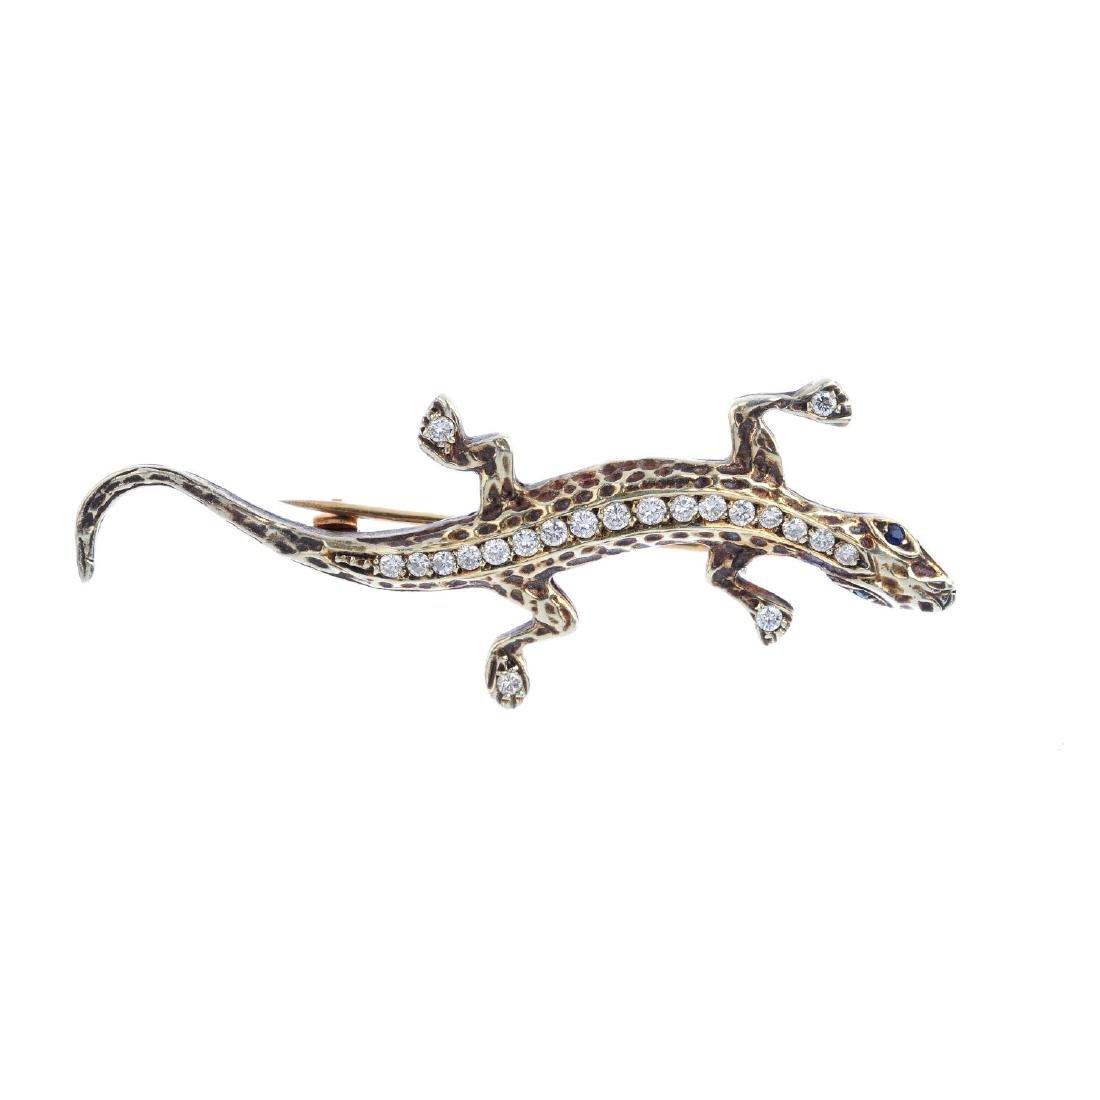 A 9ct gold diamond and sapphire salamander brooch.